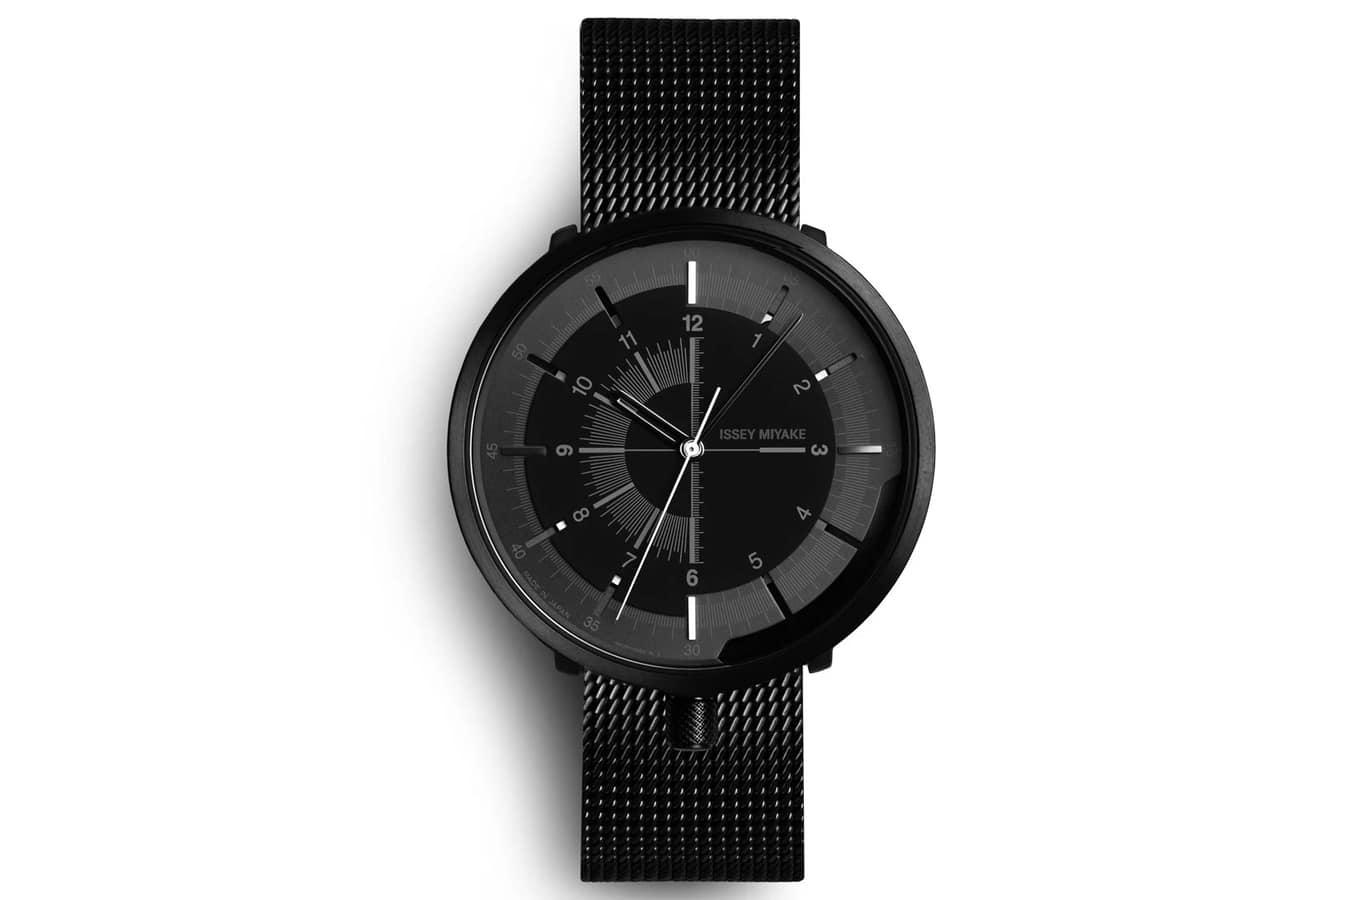 issey miyake 16 mechanical watch